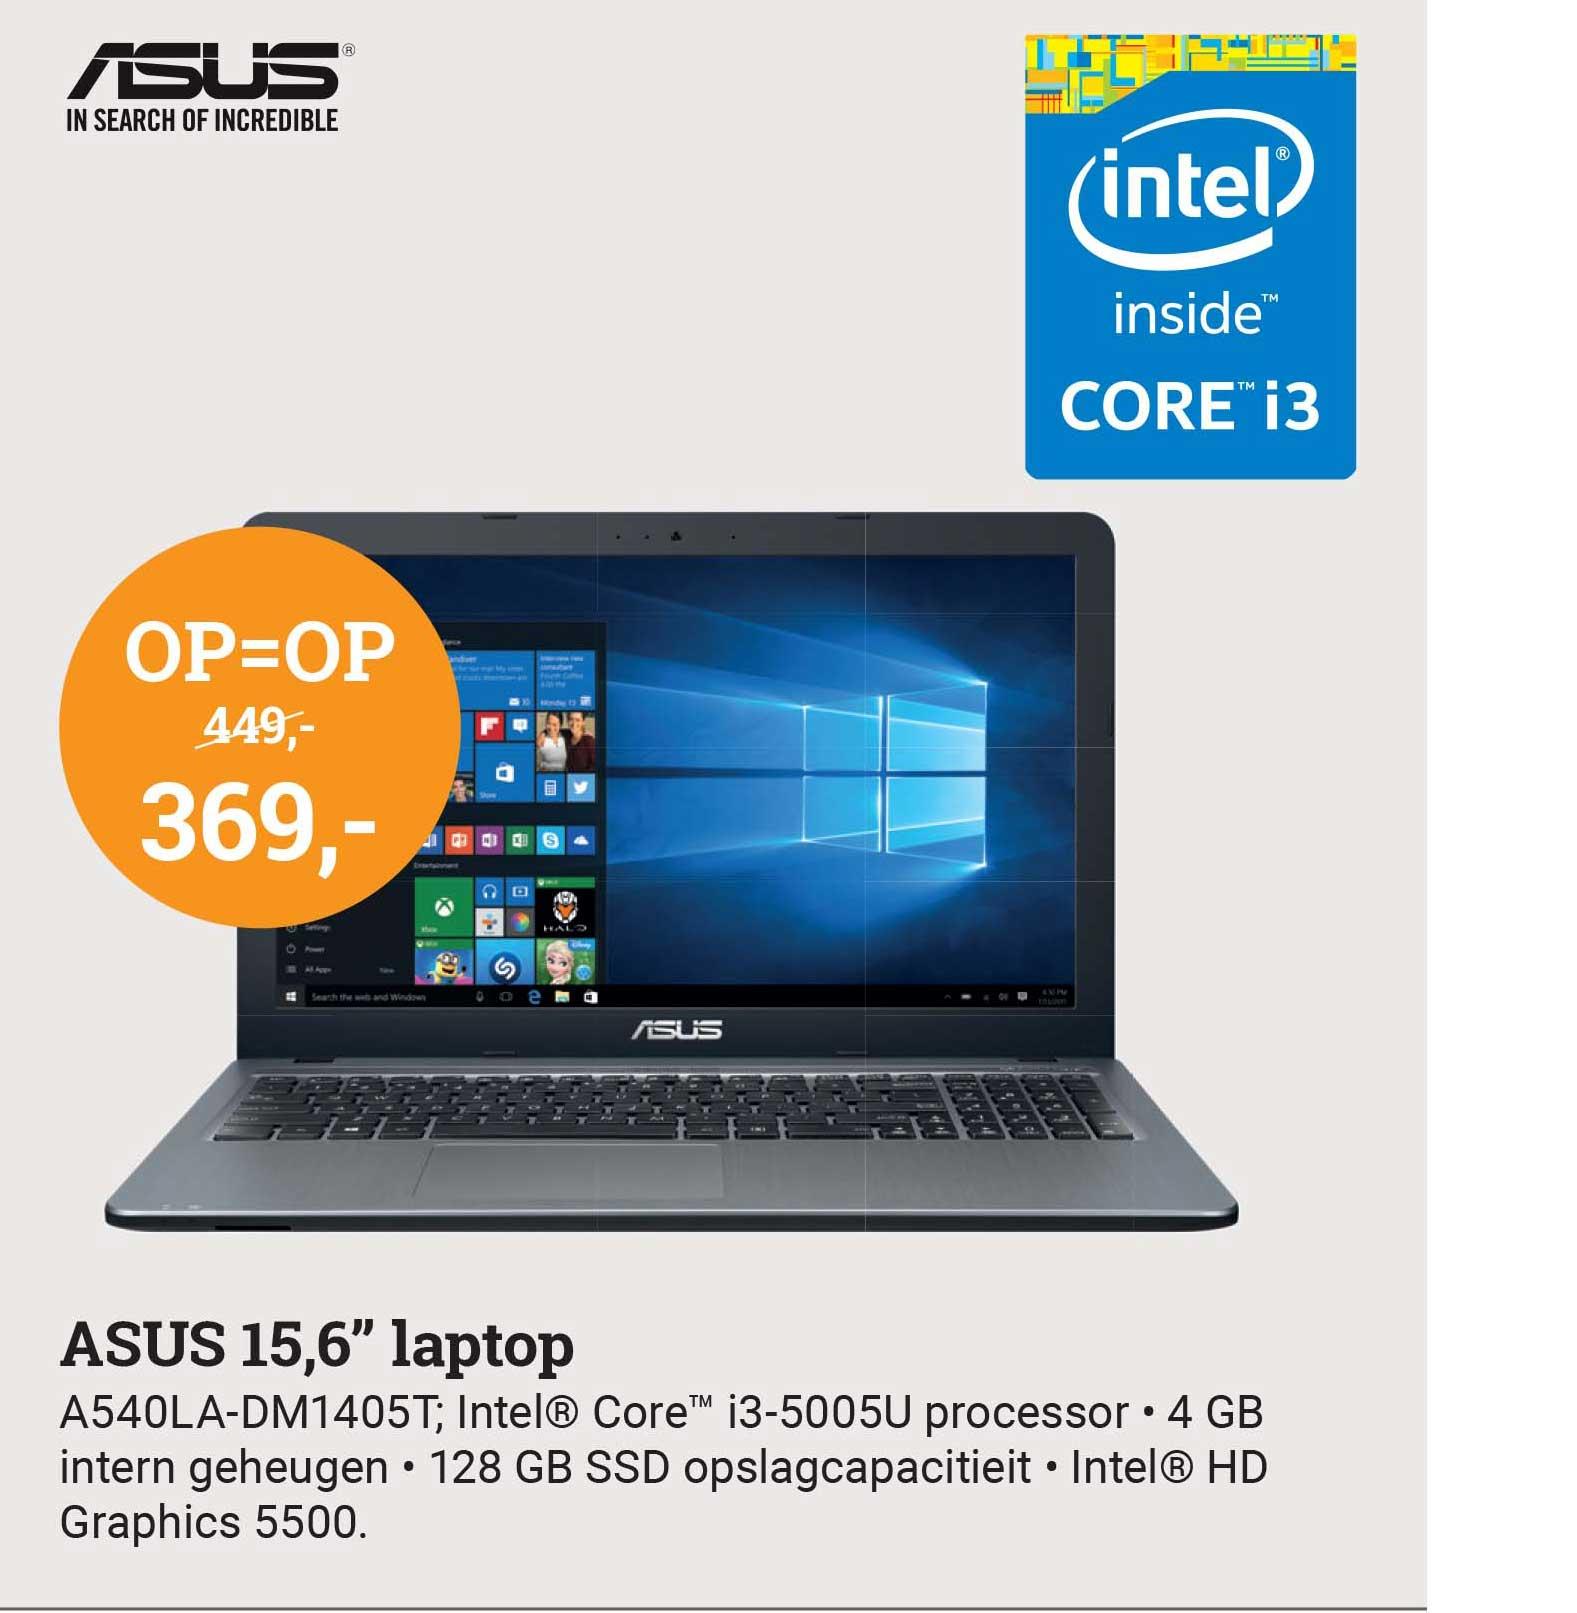 BCC Asus 15.6 Inch Laptop